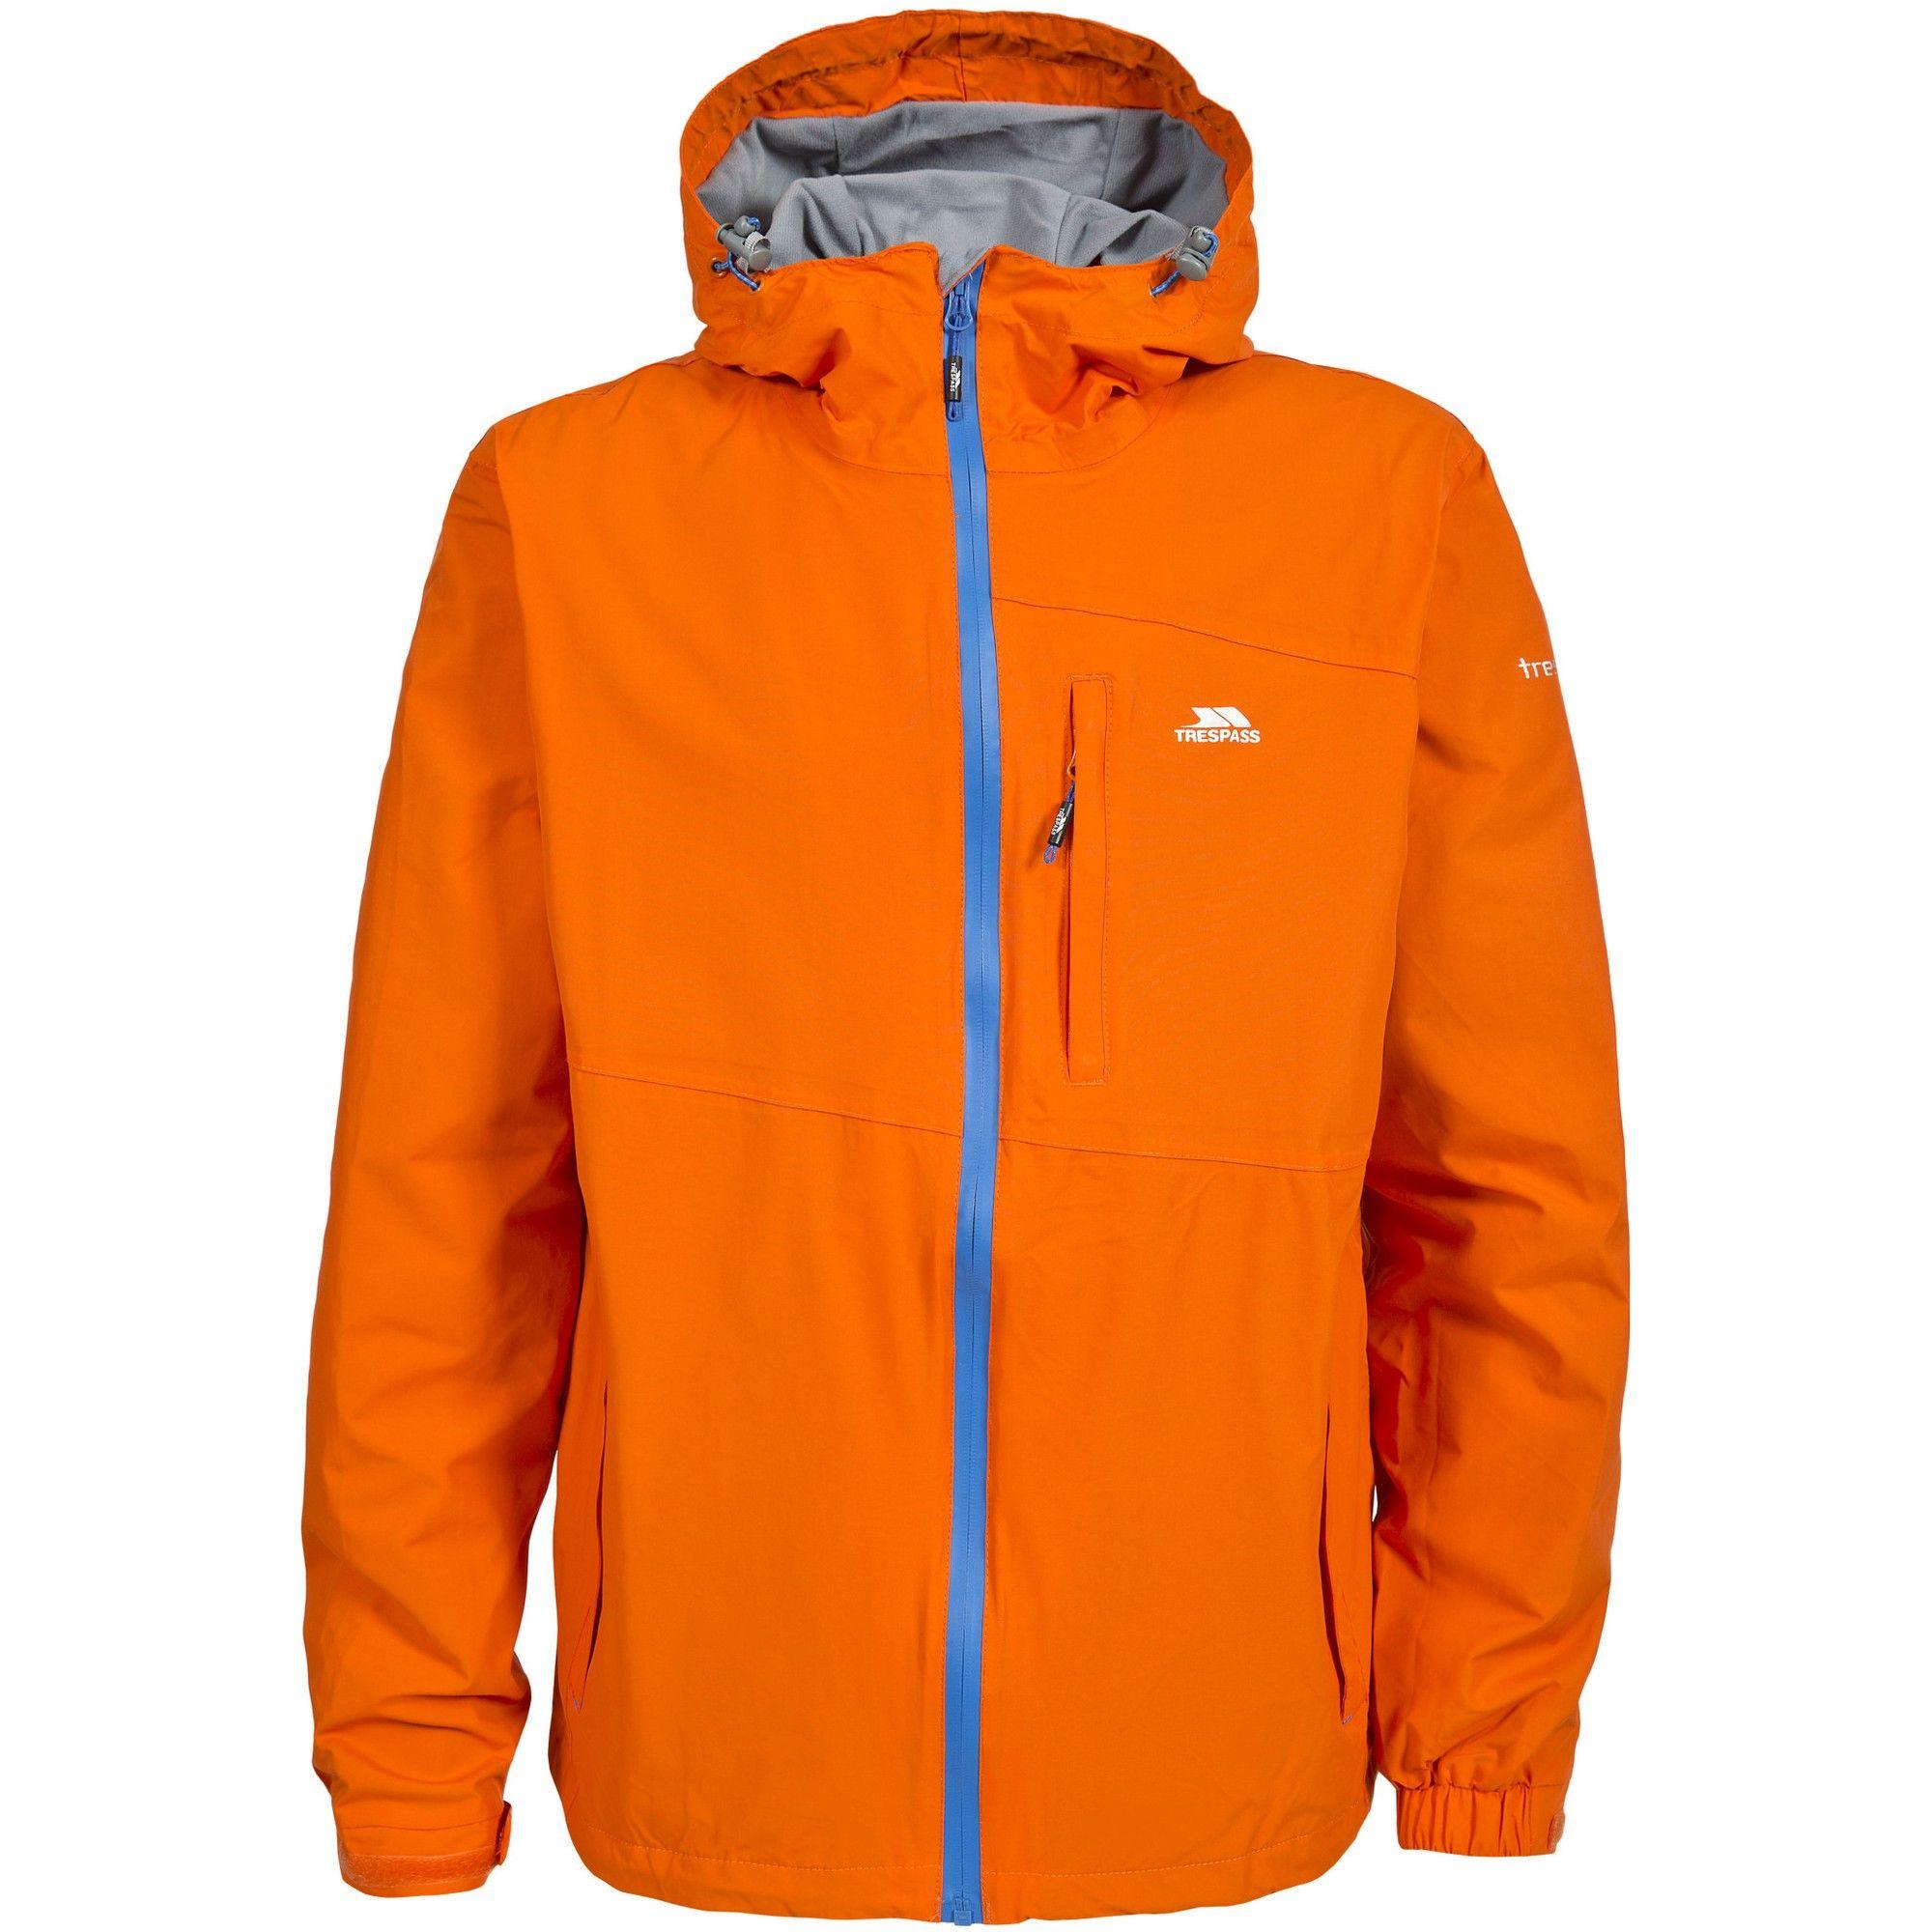 Trespass Mens Hilman II Waterproof Jacket